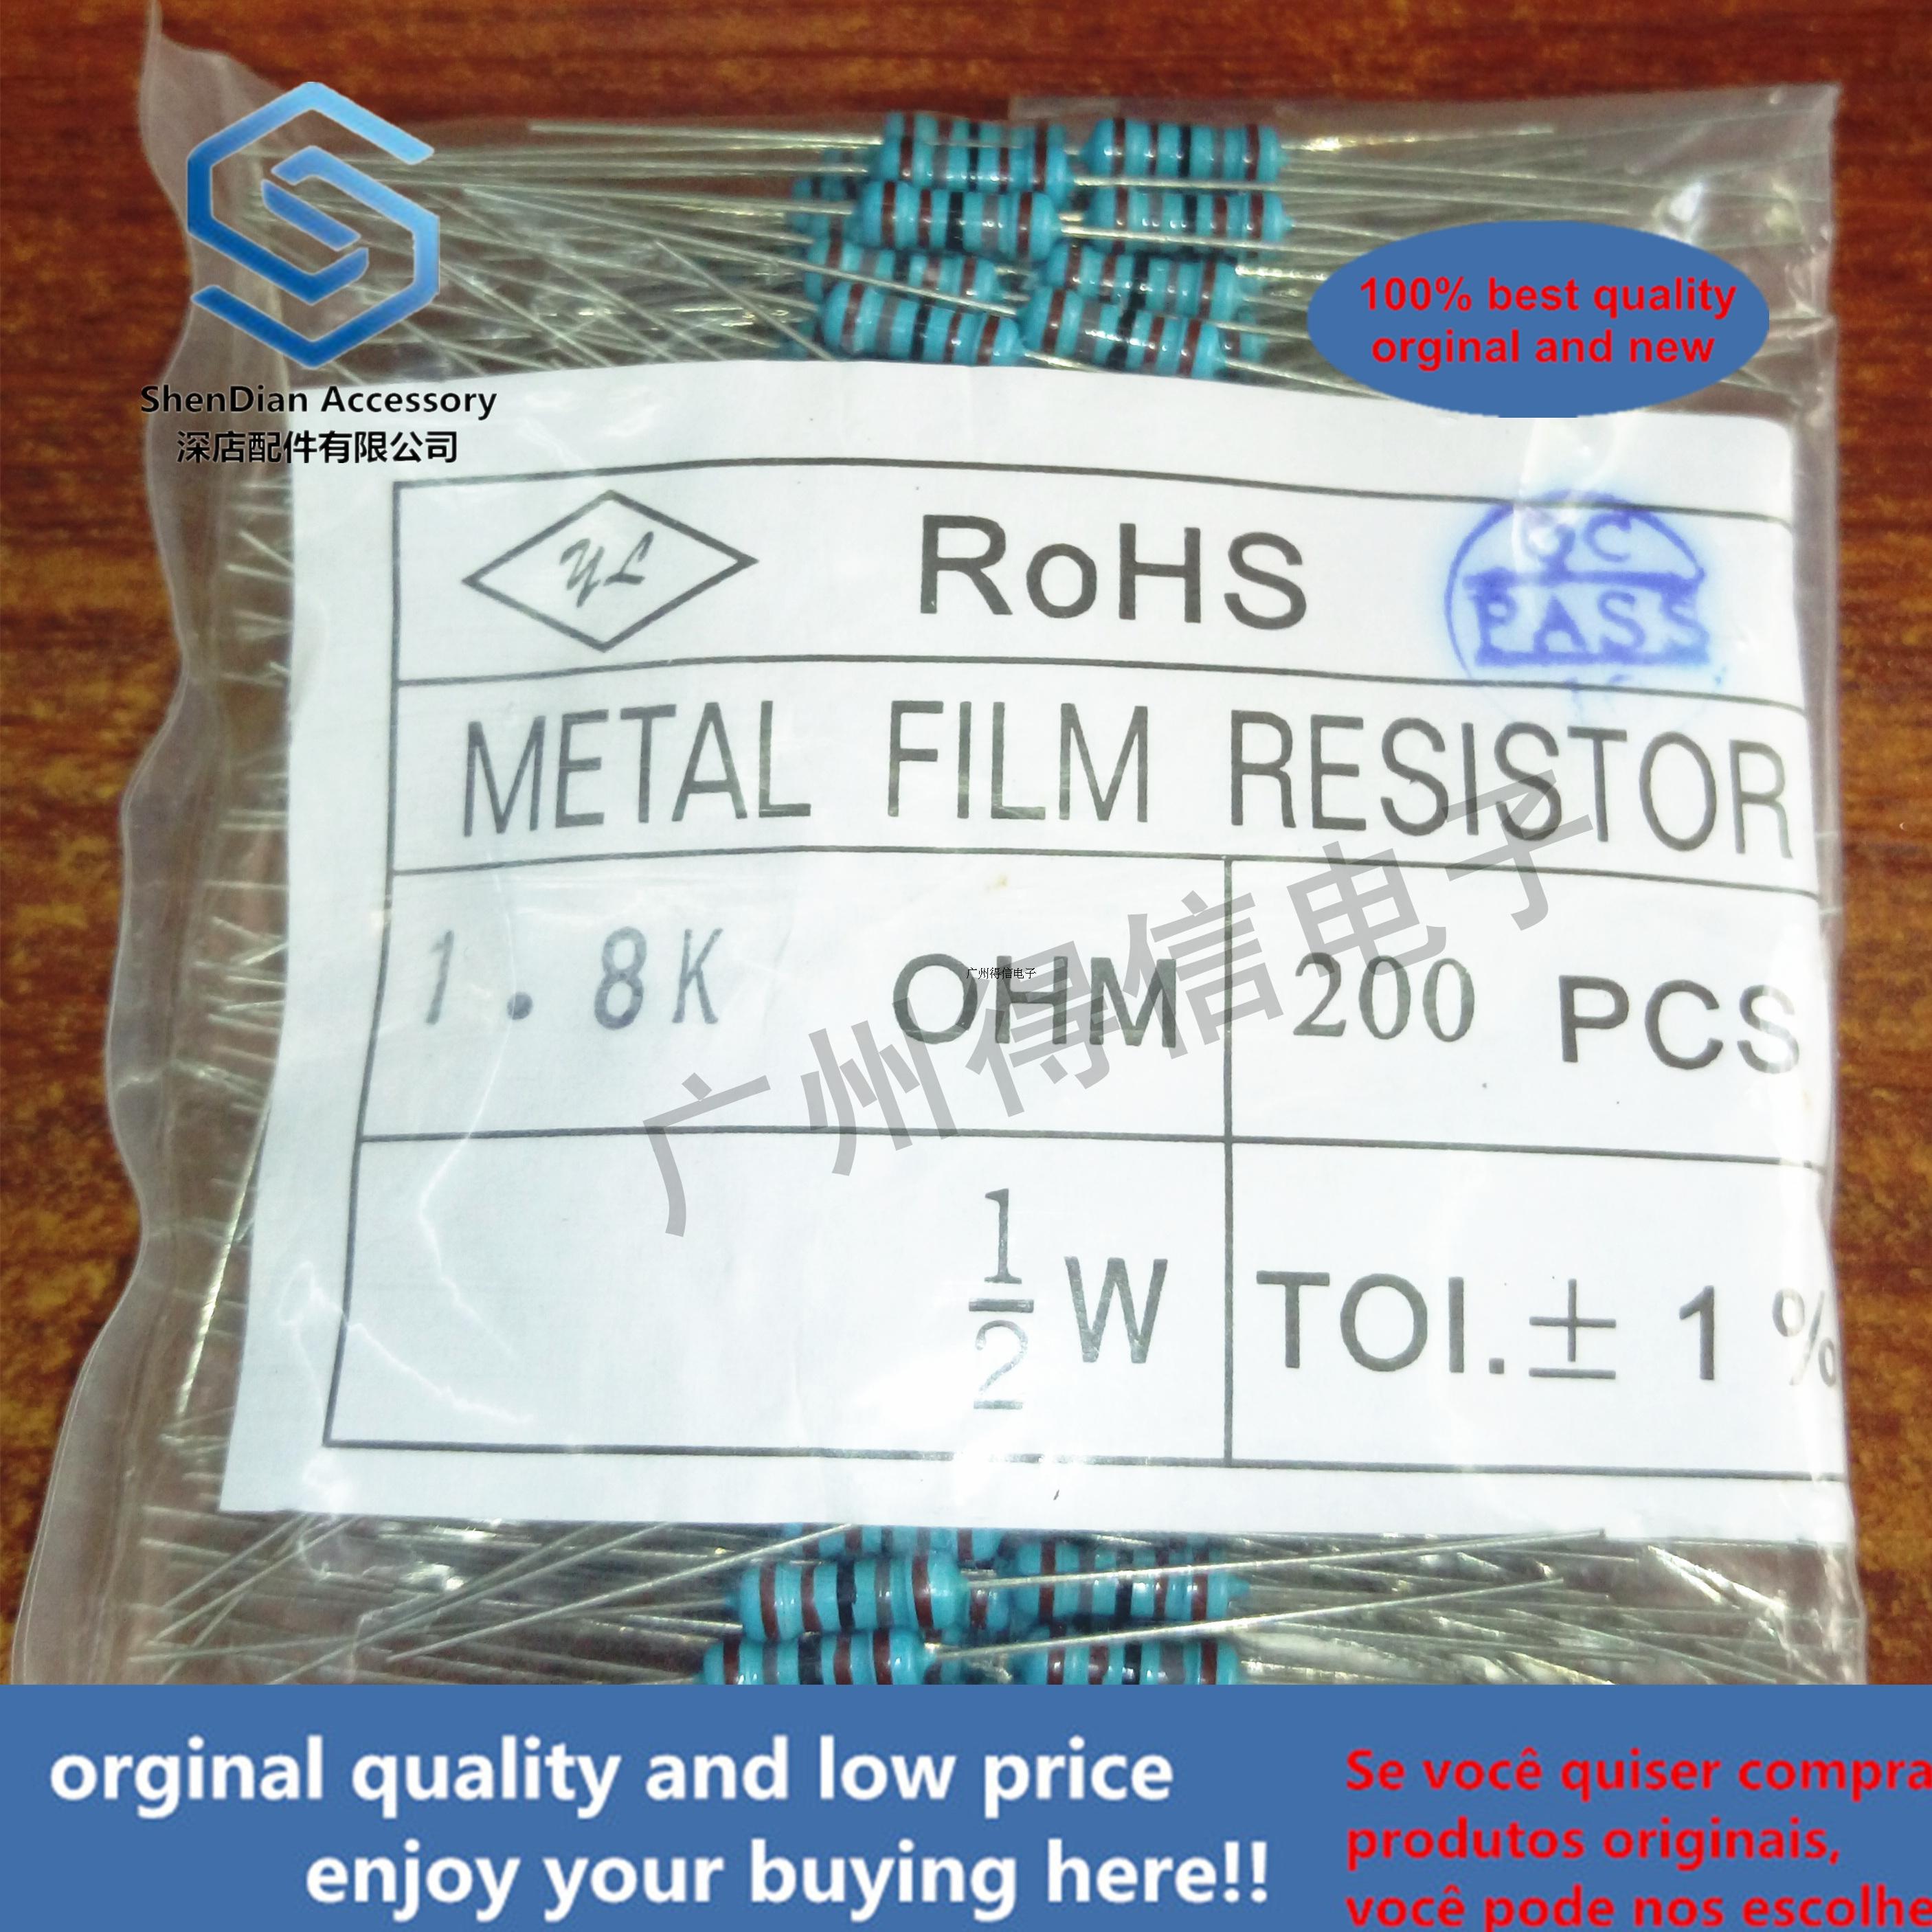 200PCS 1 / 2W 3.6K 3600 Euro 1% Brand New Metal Film Iron Feet Resistance Bag Pack 200 Pcs